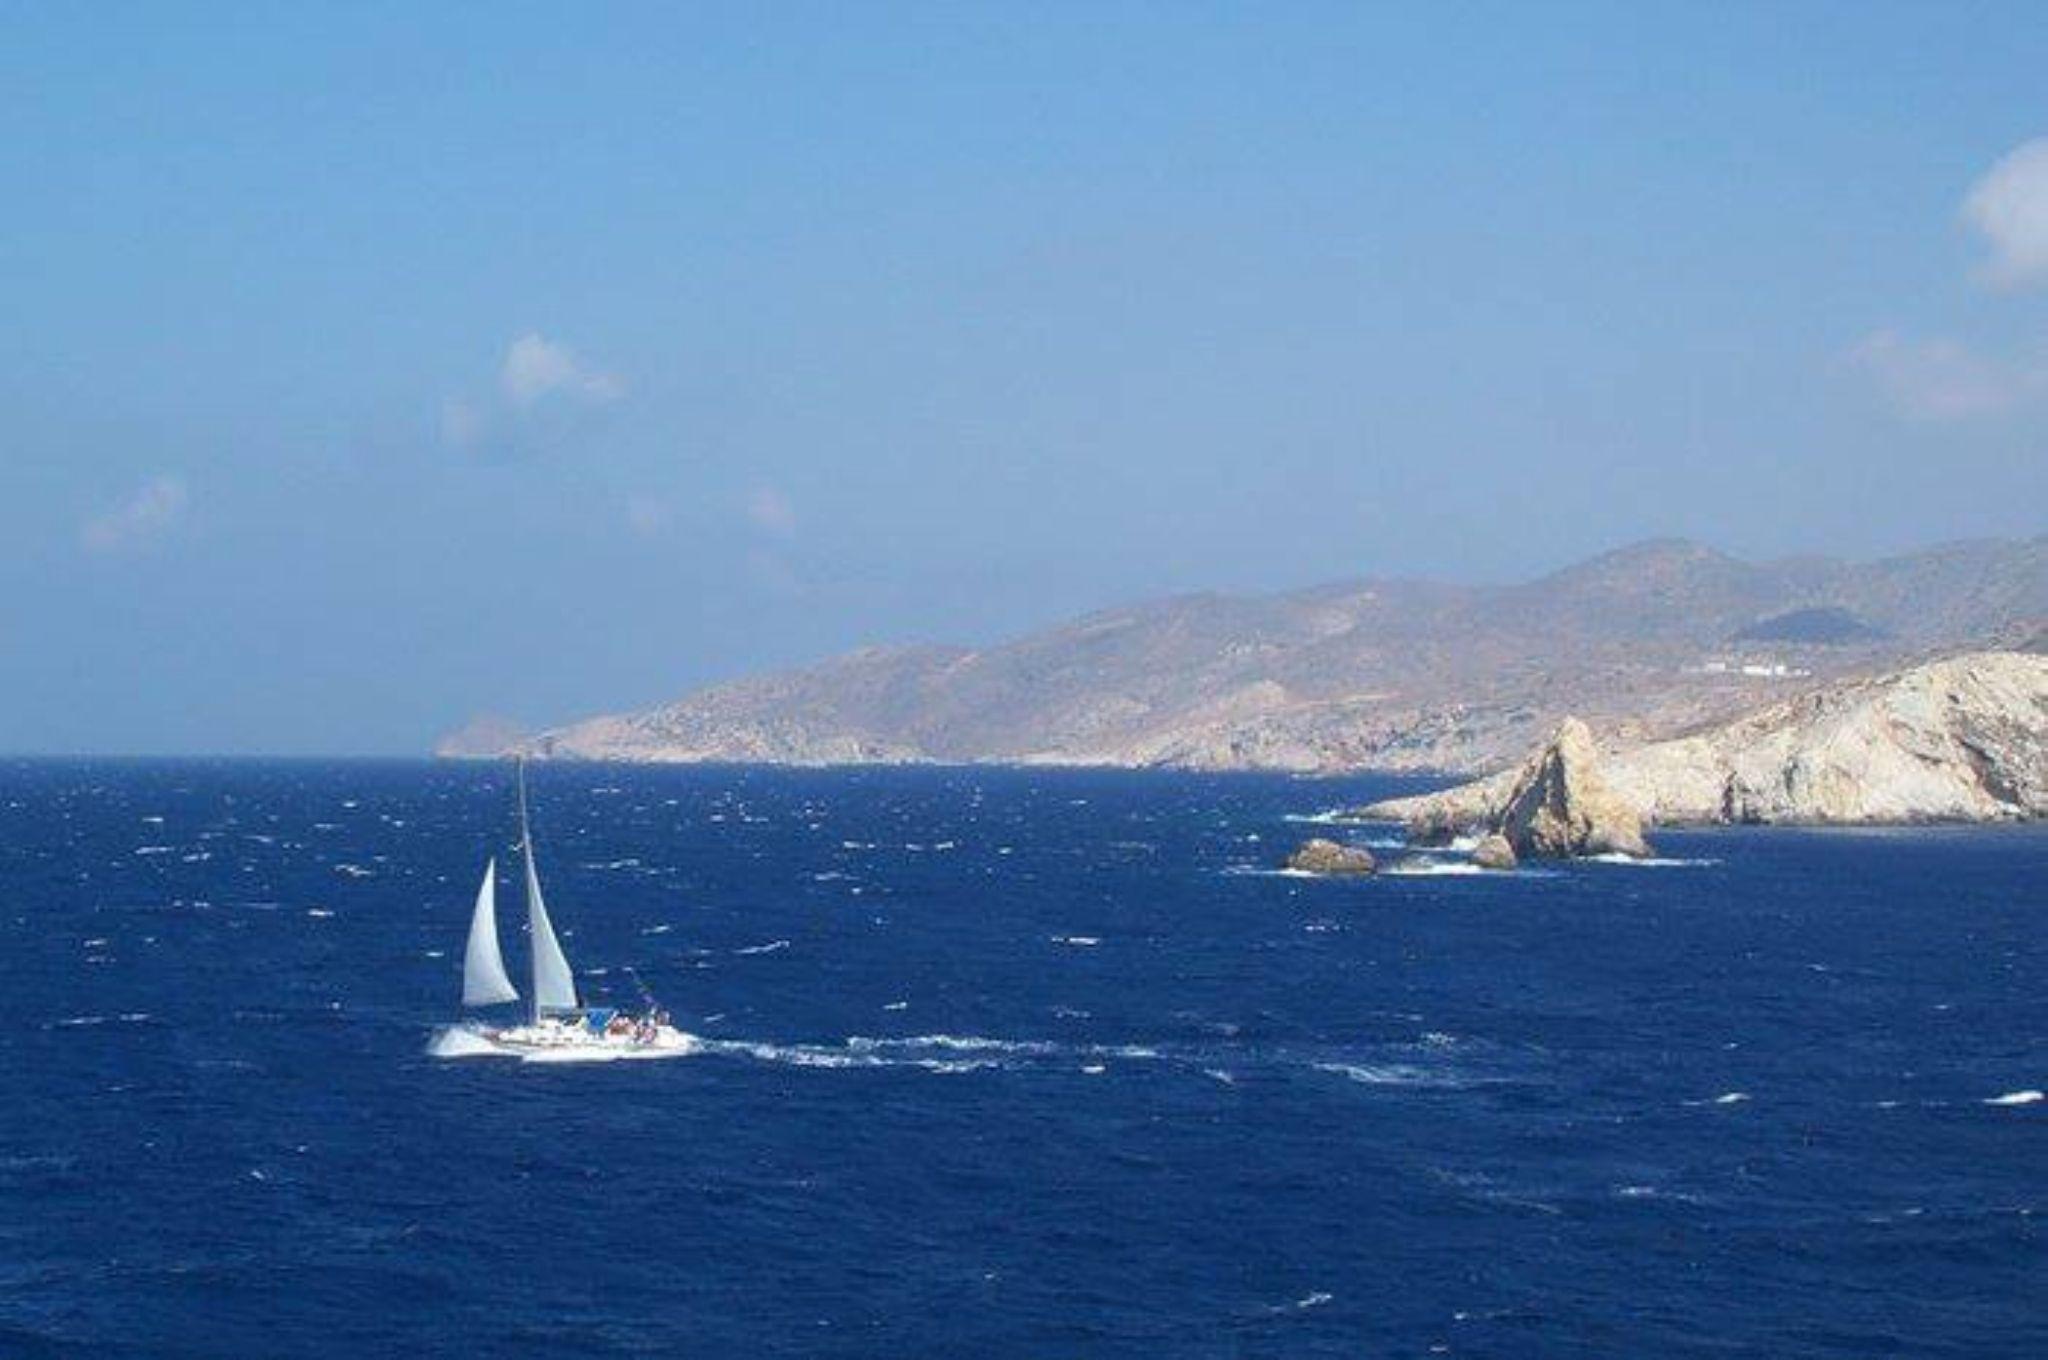 Sailing.. by kasiospaul